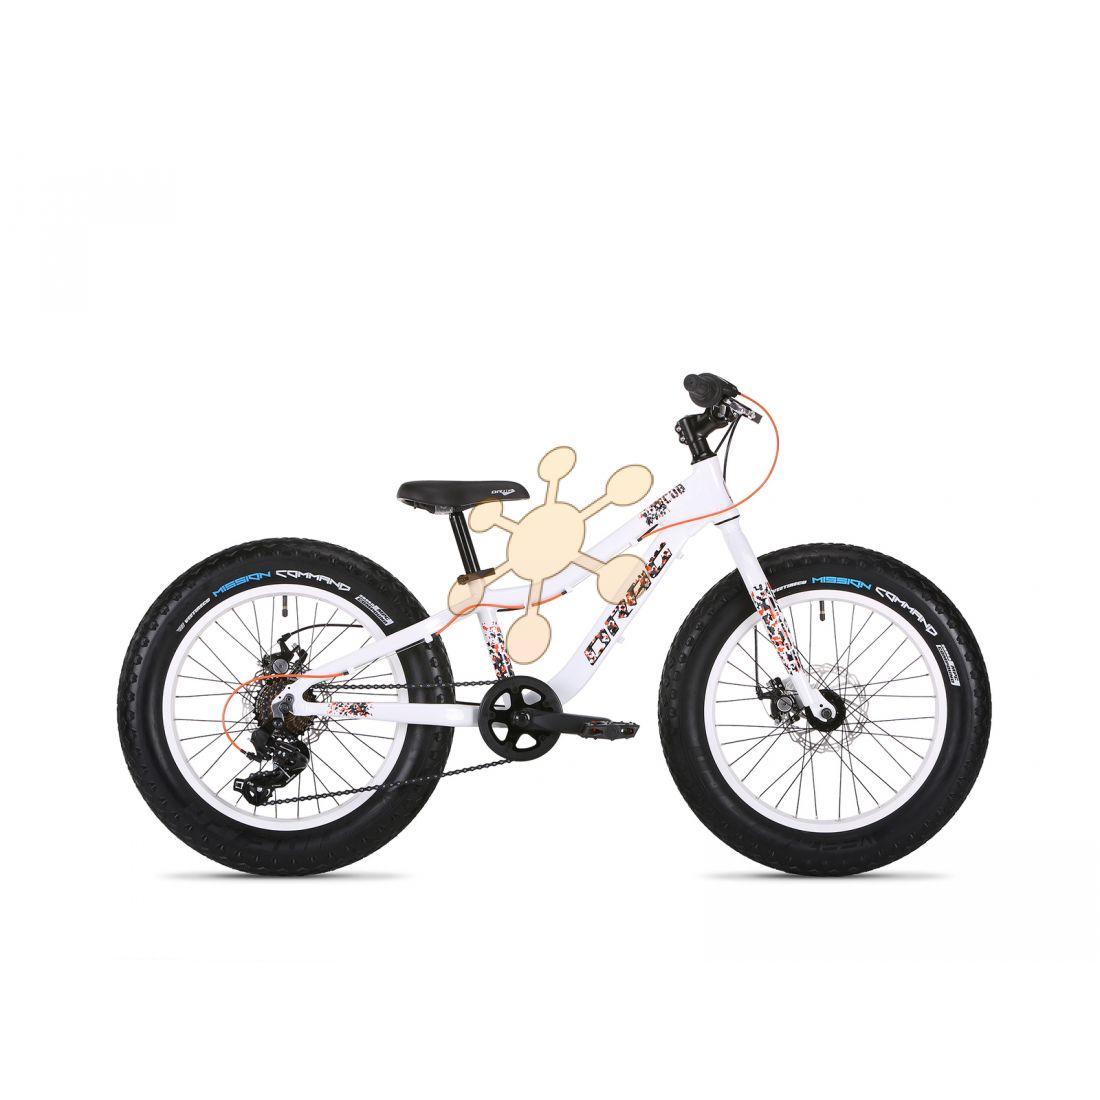 5aa4b8d8c1cd dragbicykle.sk - Bicykle - Detské bicykle - Drag CUBdetský bicykel